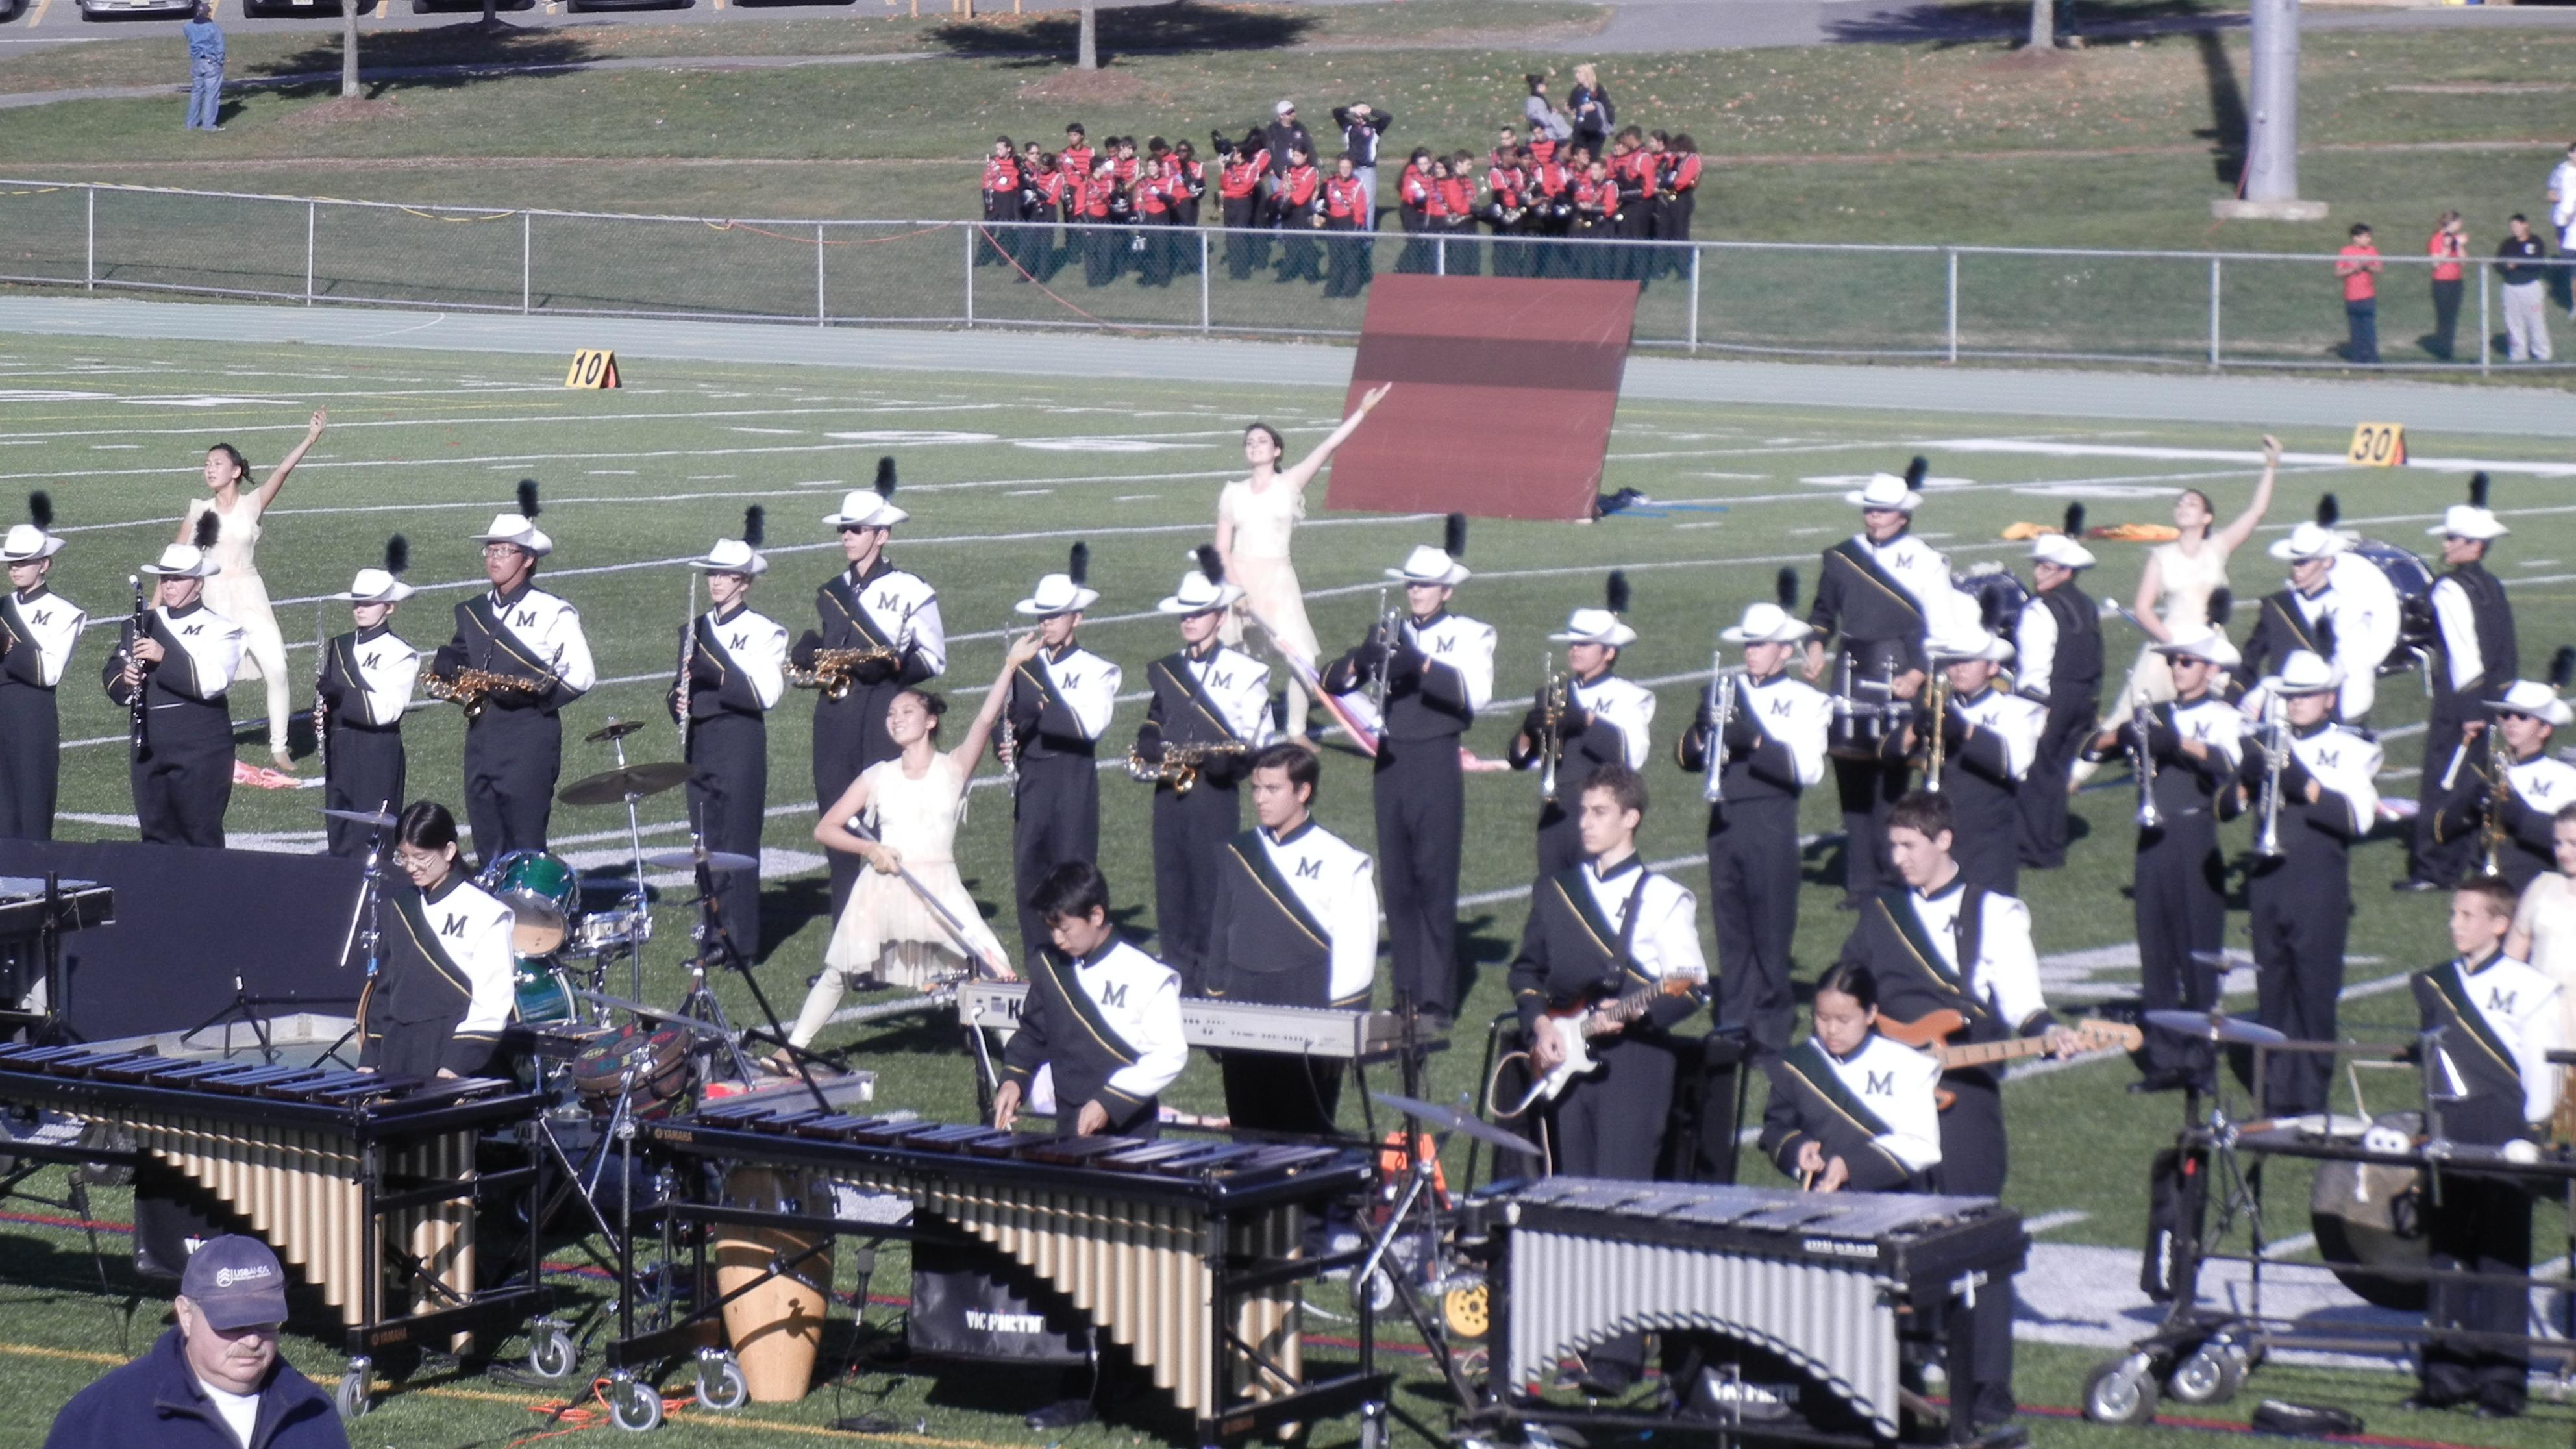 31a1f6d0f5db54393ef4_Montville_High_School_Marching_band_48.JPG